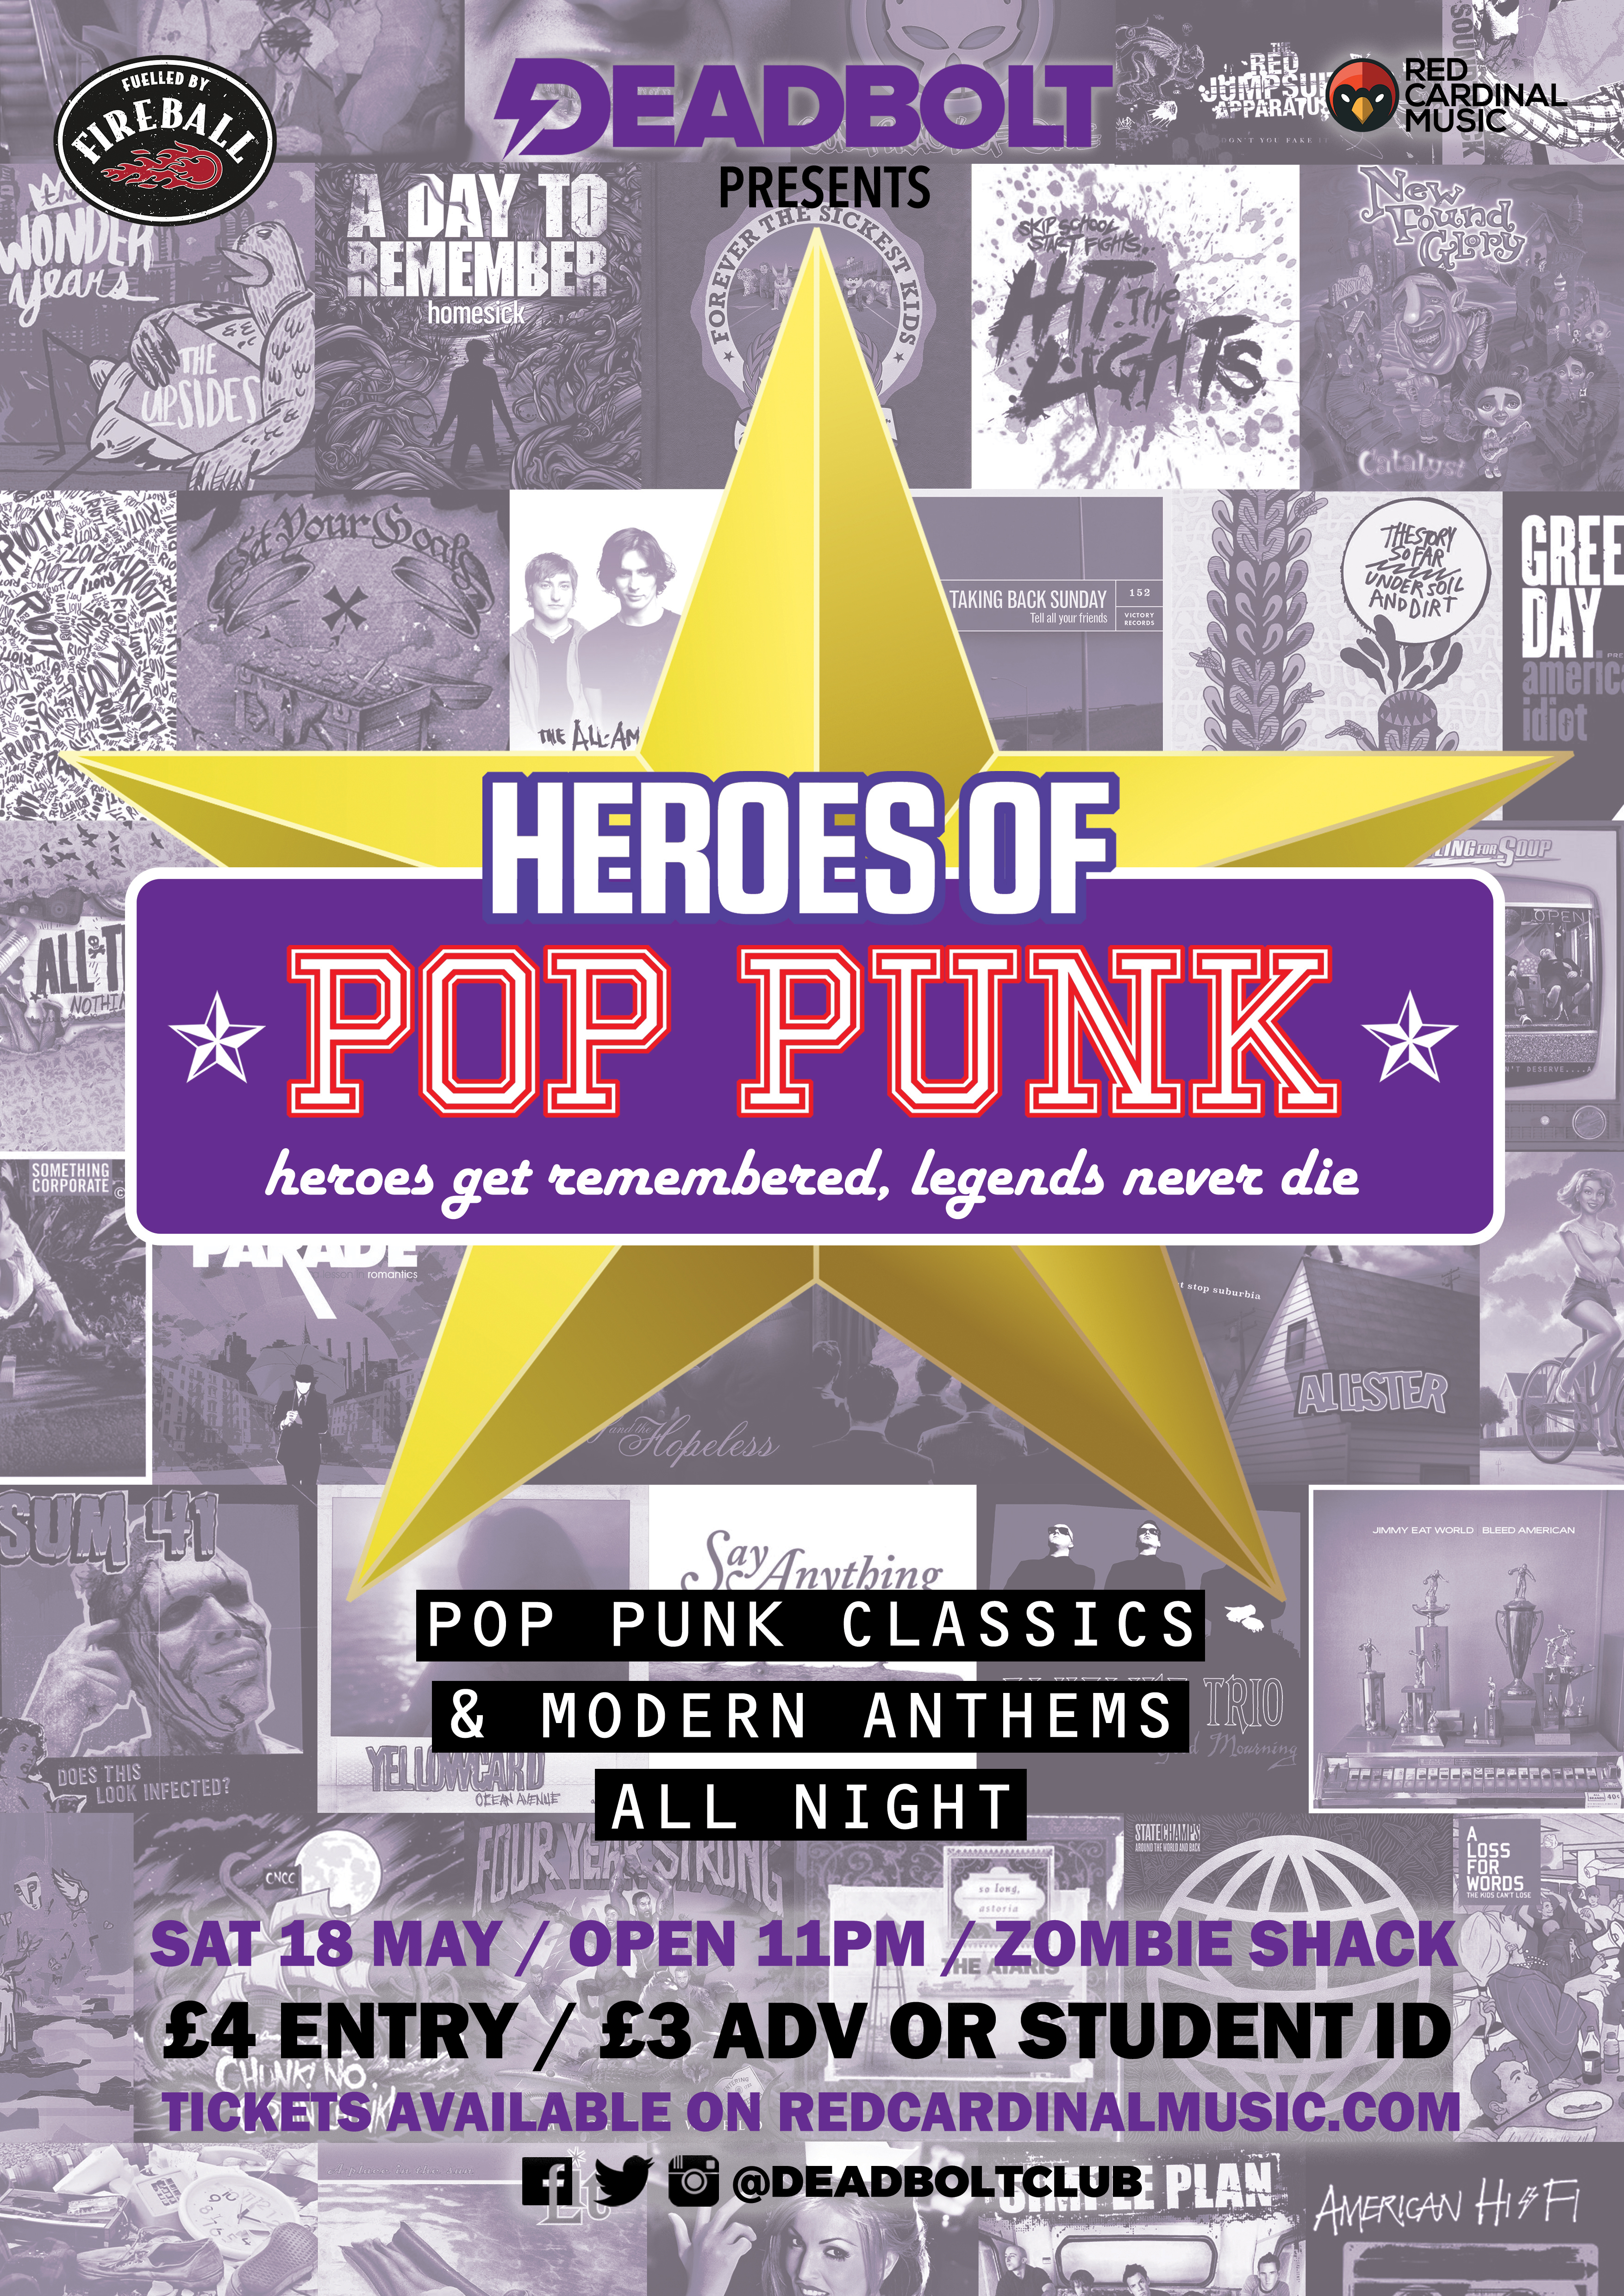 Deadbolt Heroes of Pop Punk May 19 - Red Cardinal Music